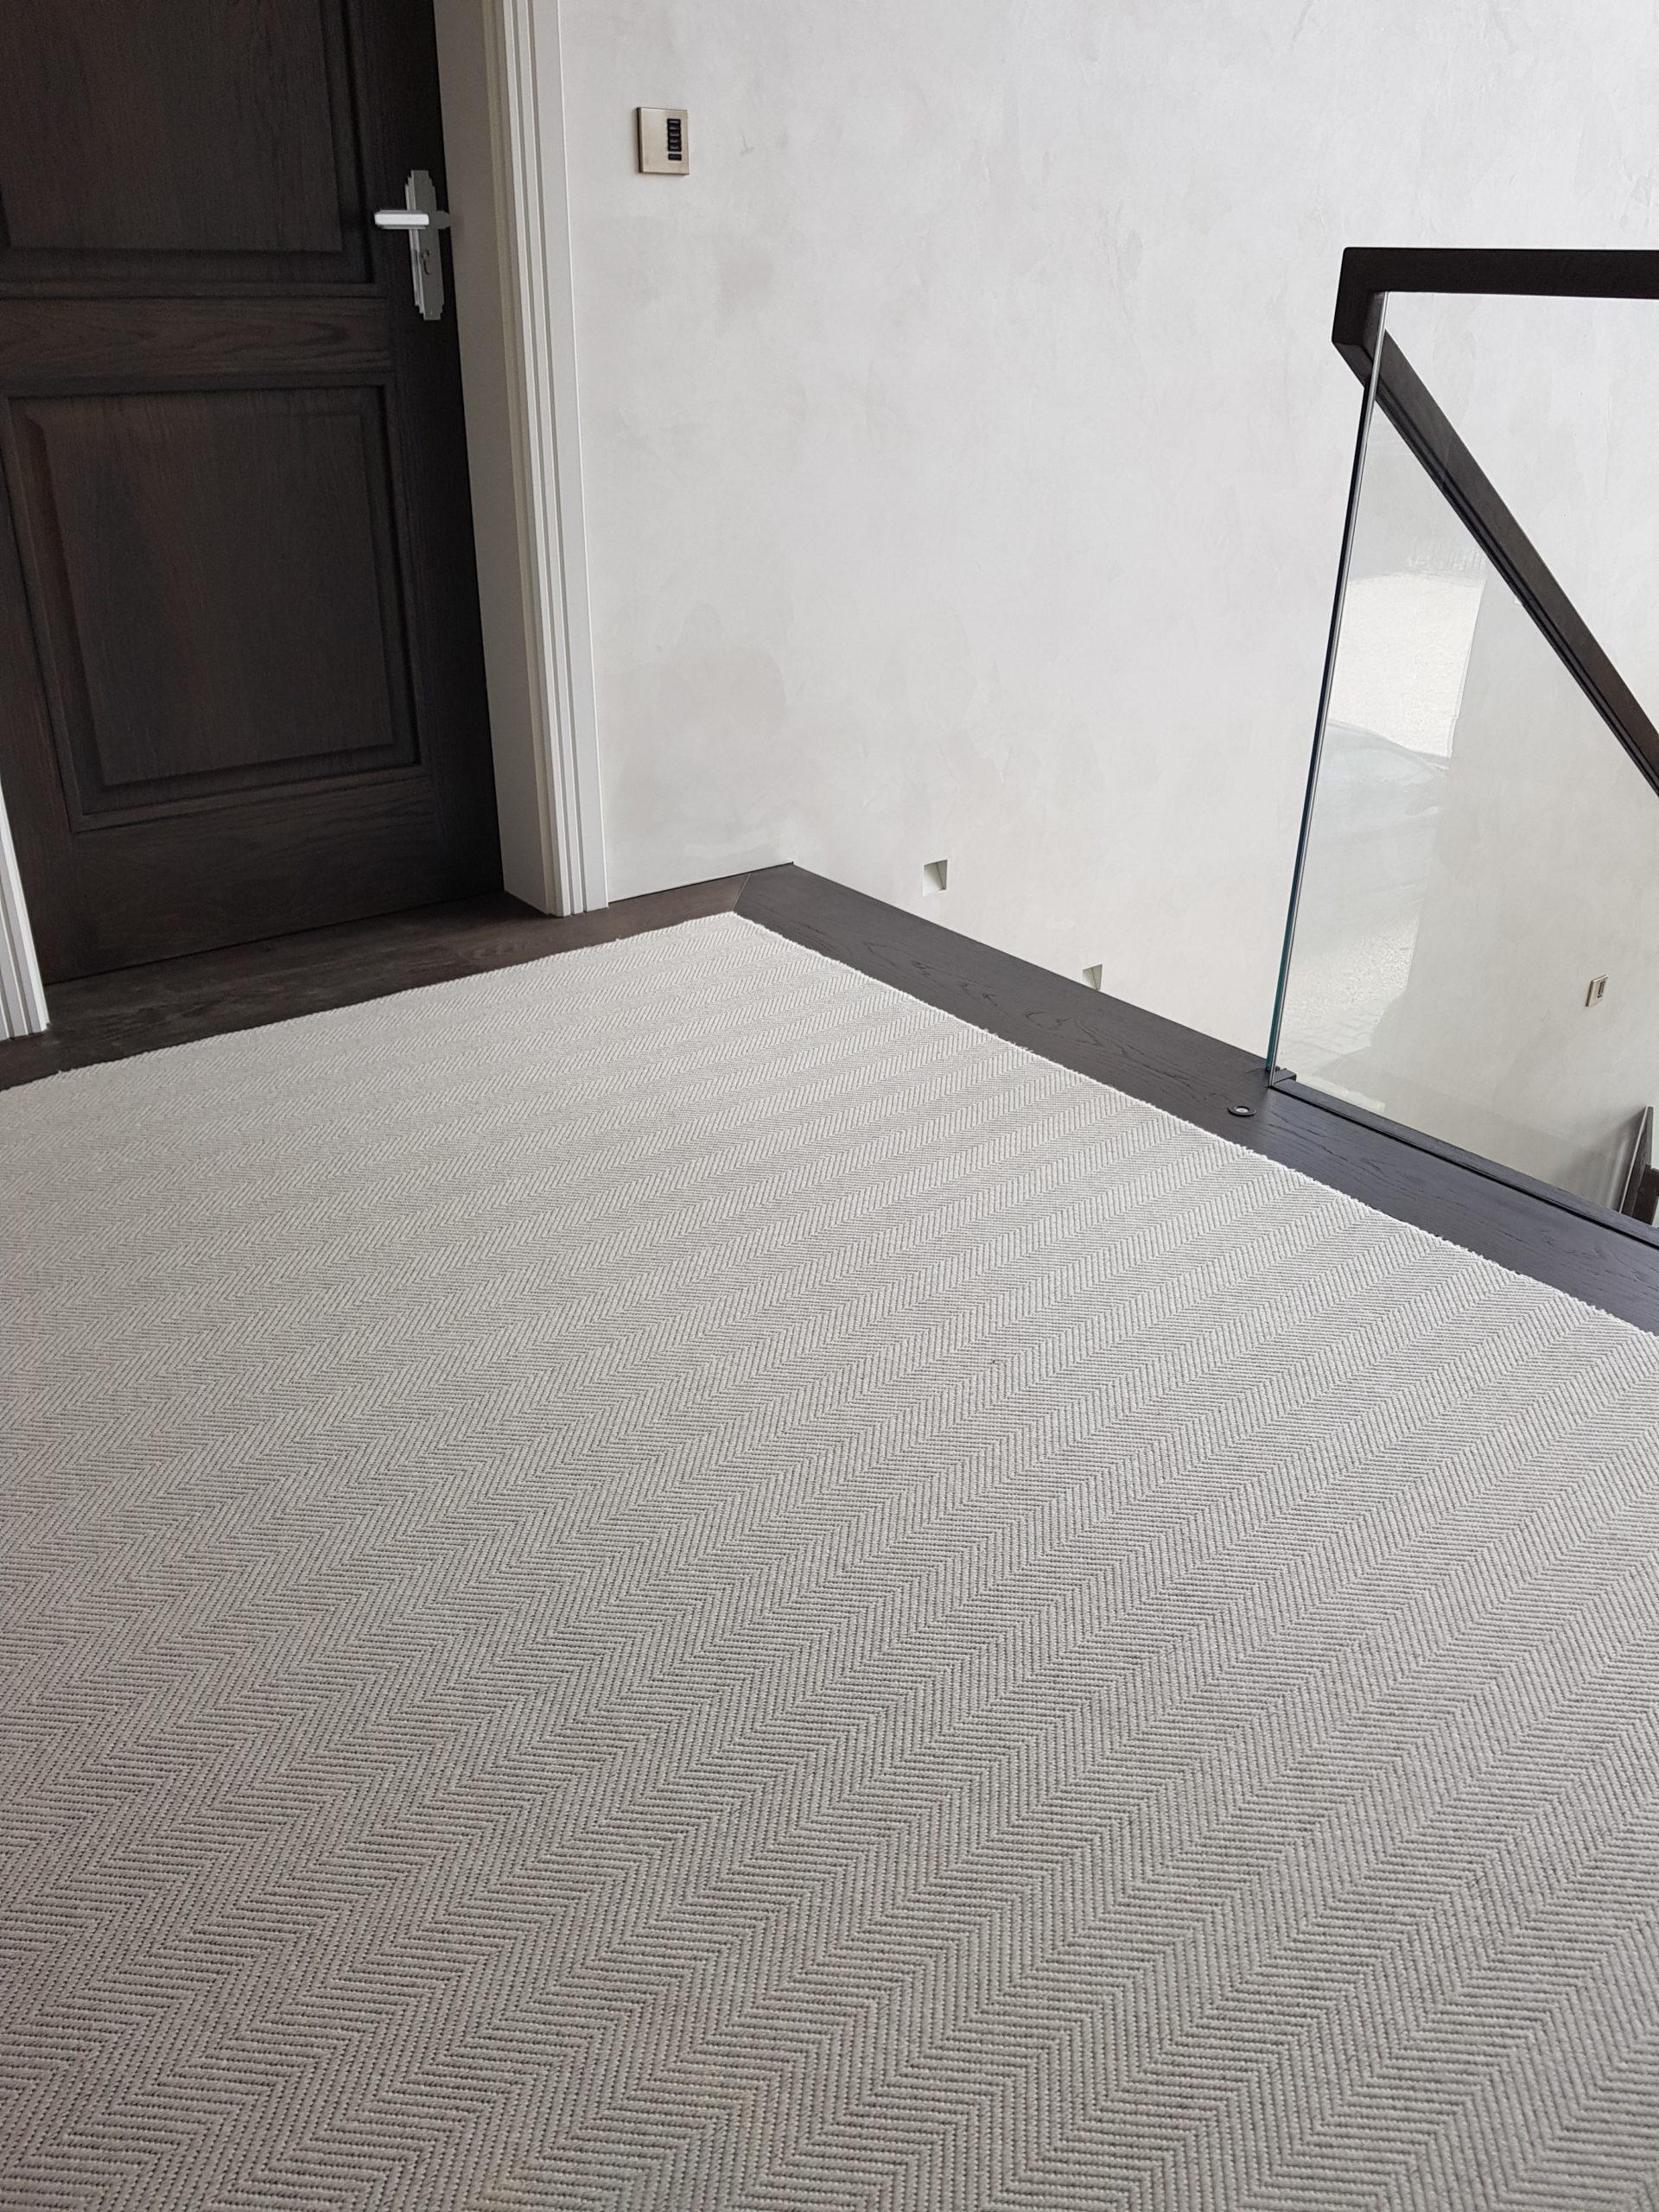 Wool Herringbone Chartwell inlaid carpet with wood floor border